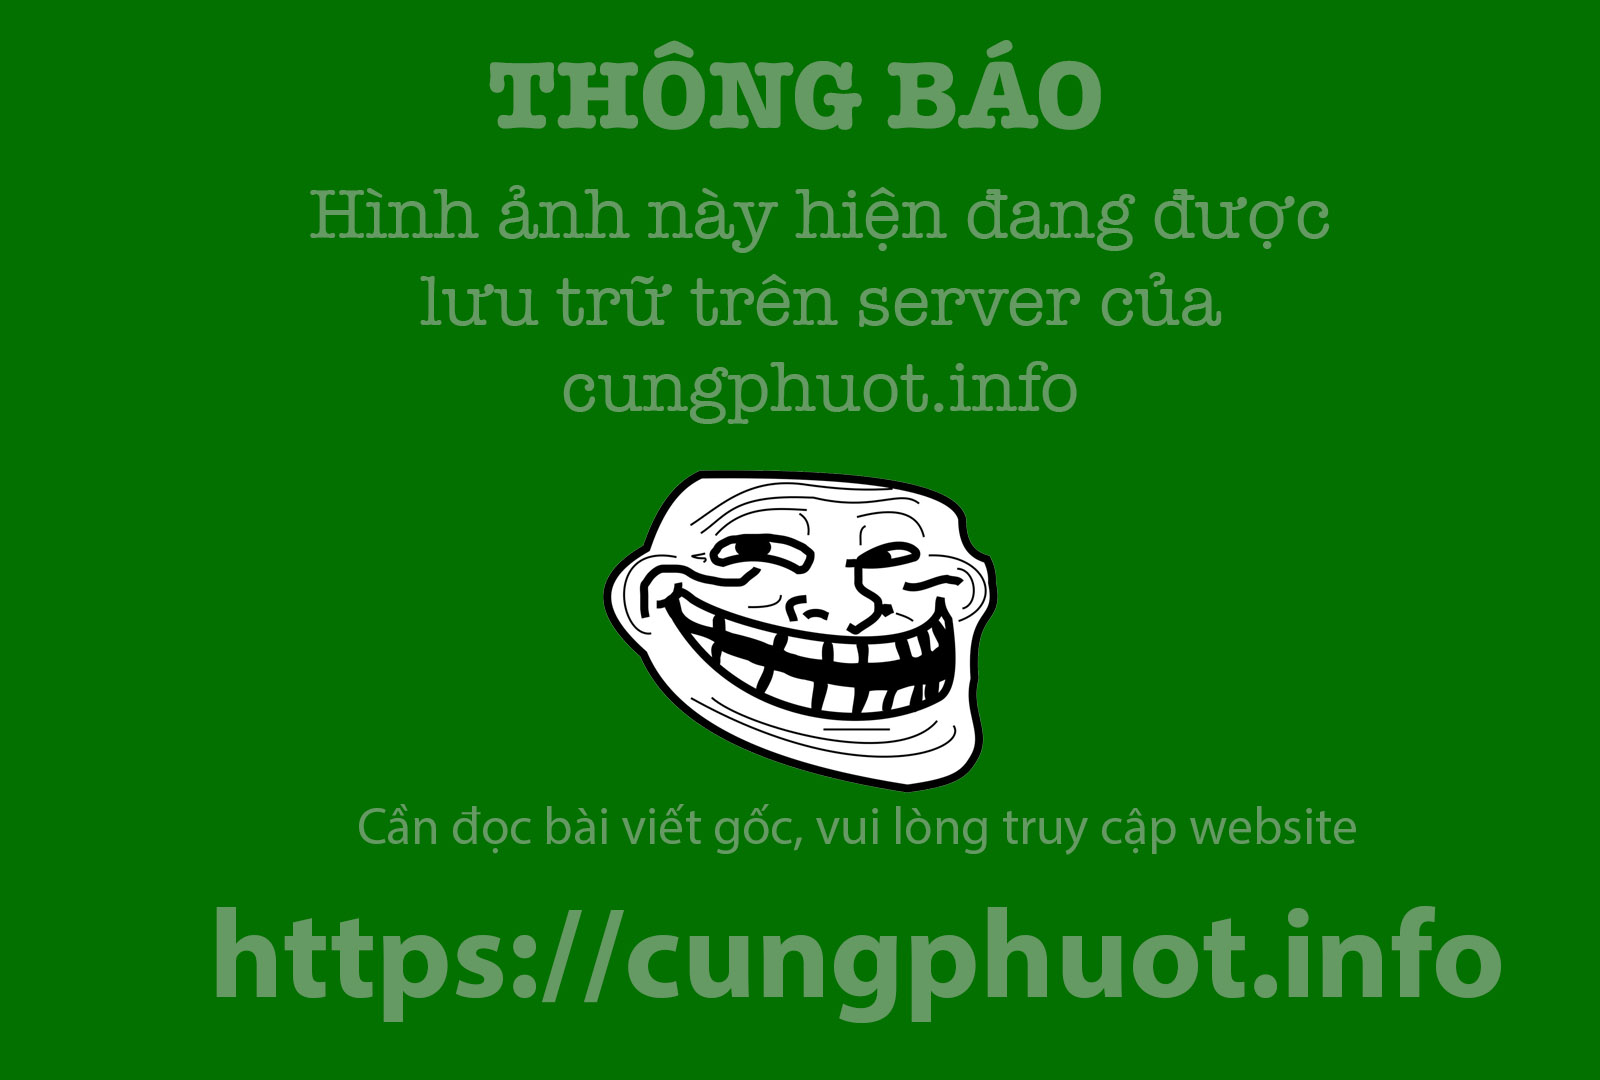 Buses to Da Lat, Lam Dong